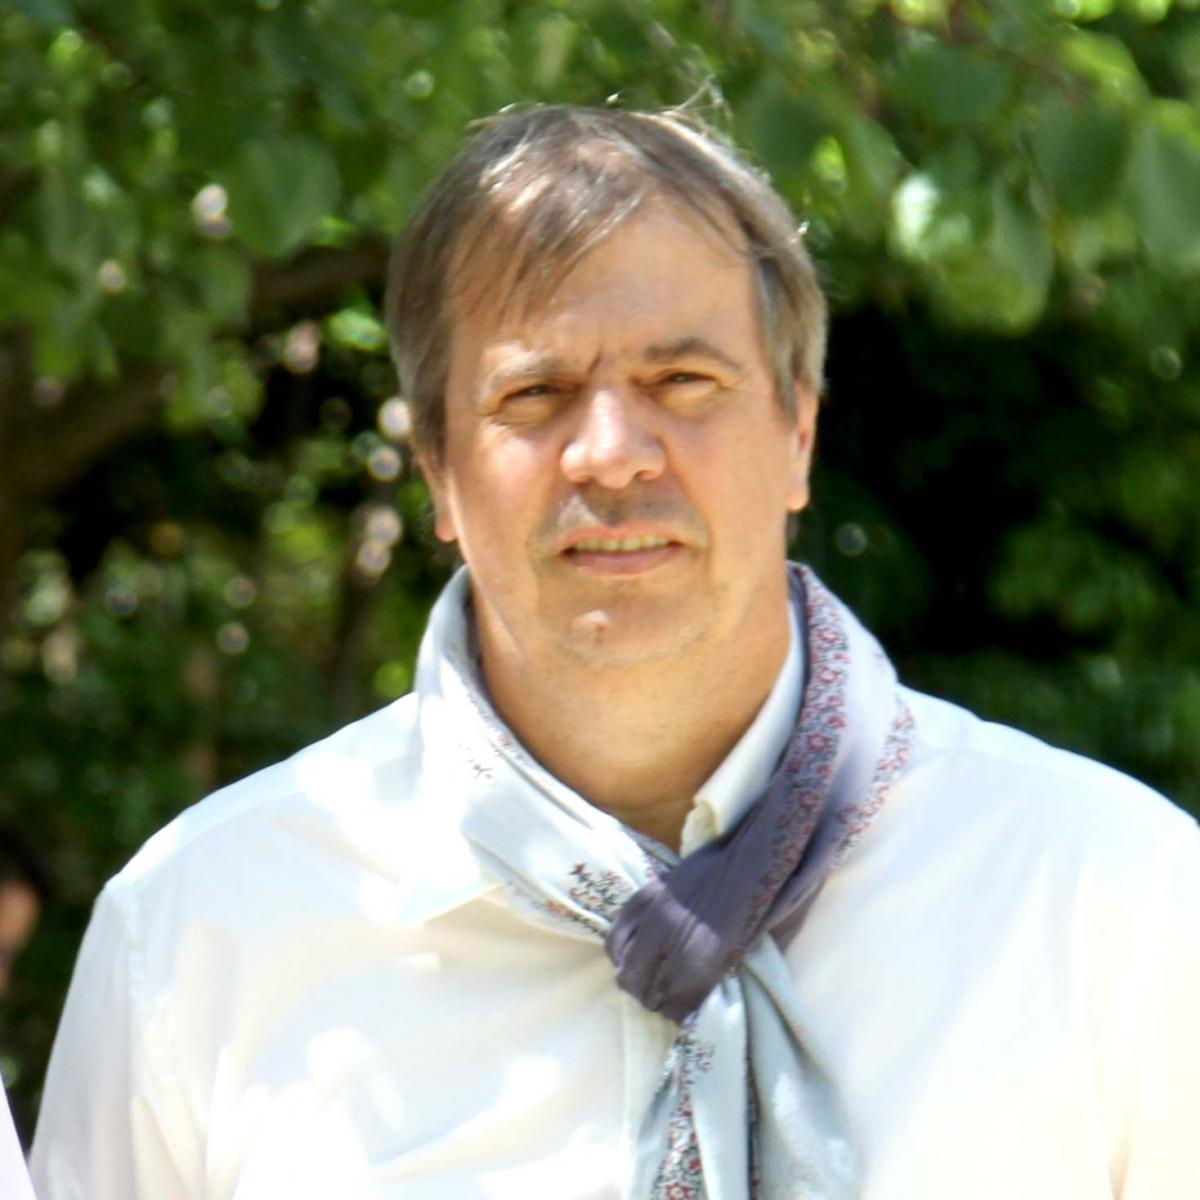 Michel Bergougnoux